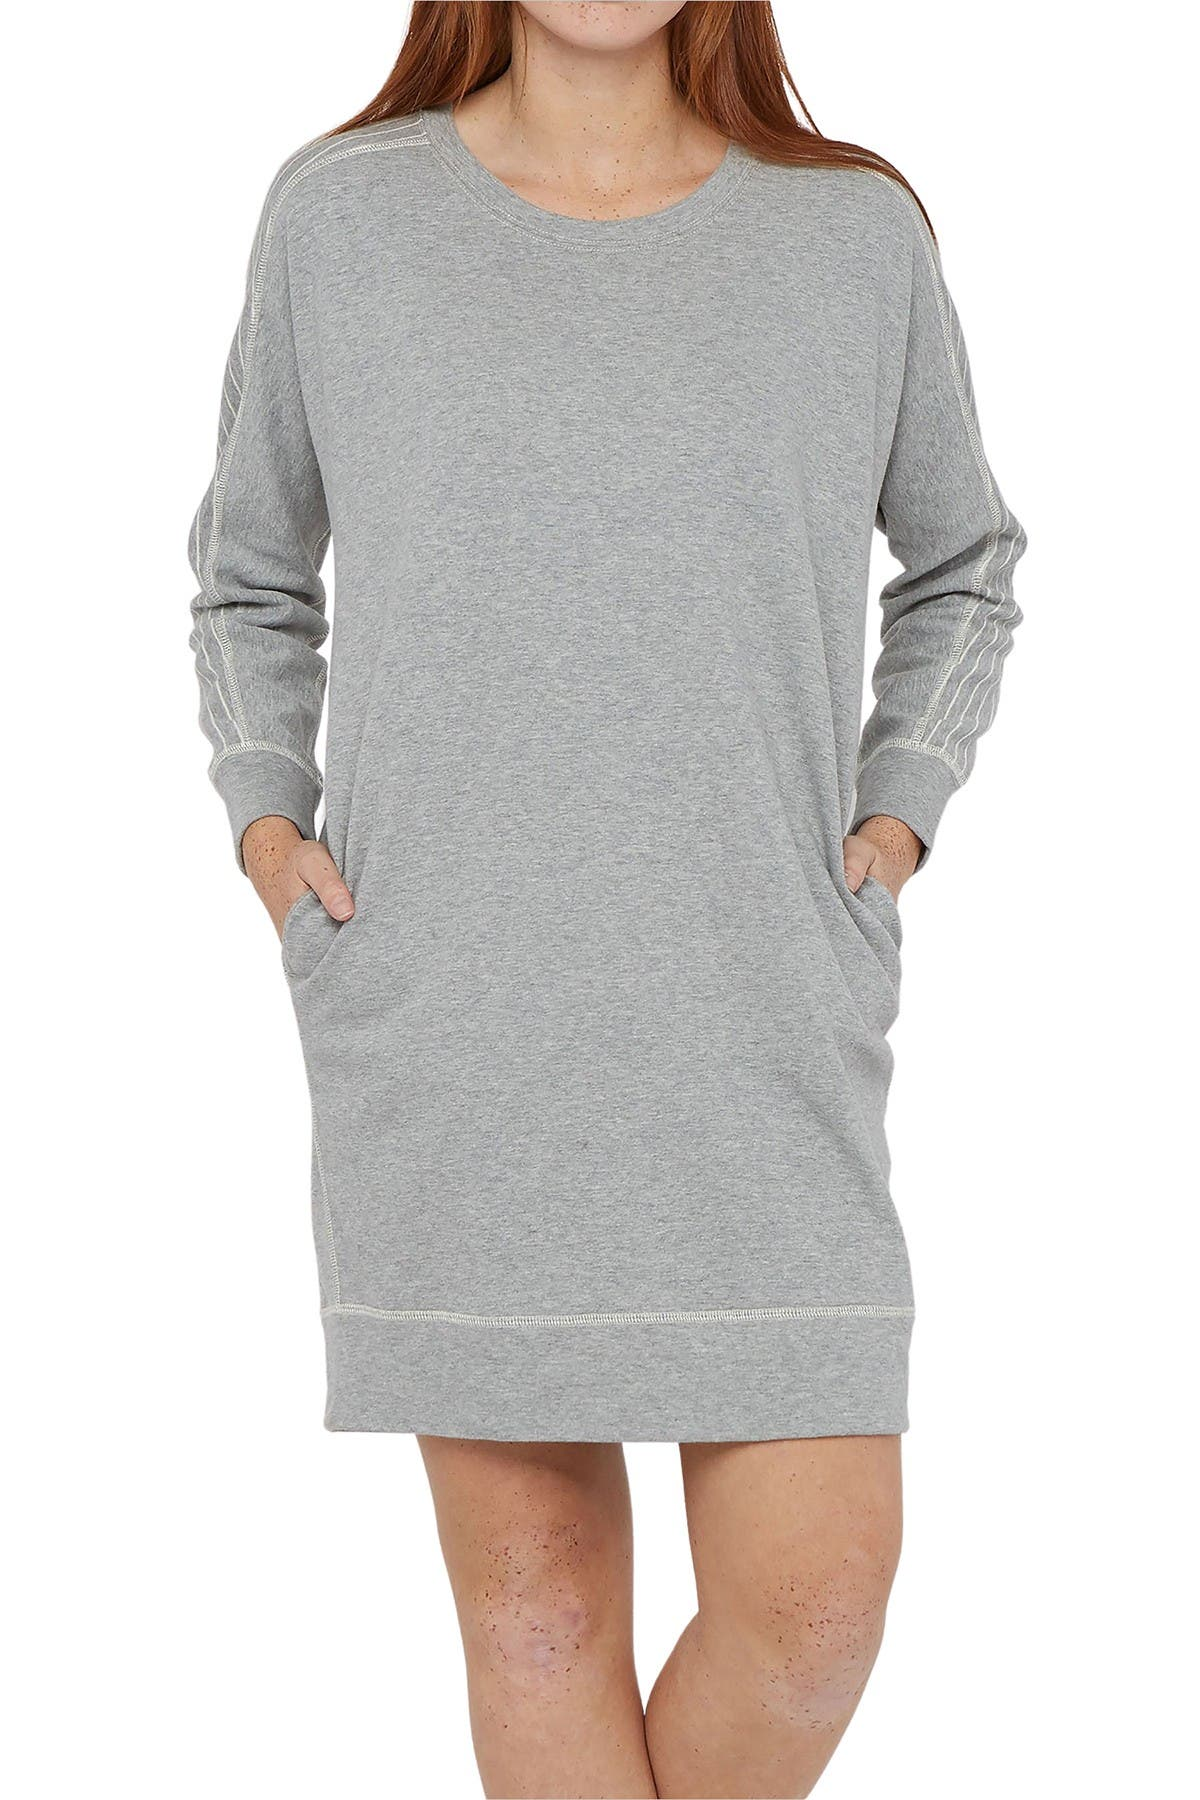 Image of Billy Reid Terry Stripe Panel Dress